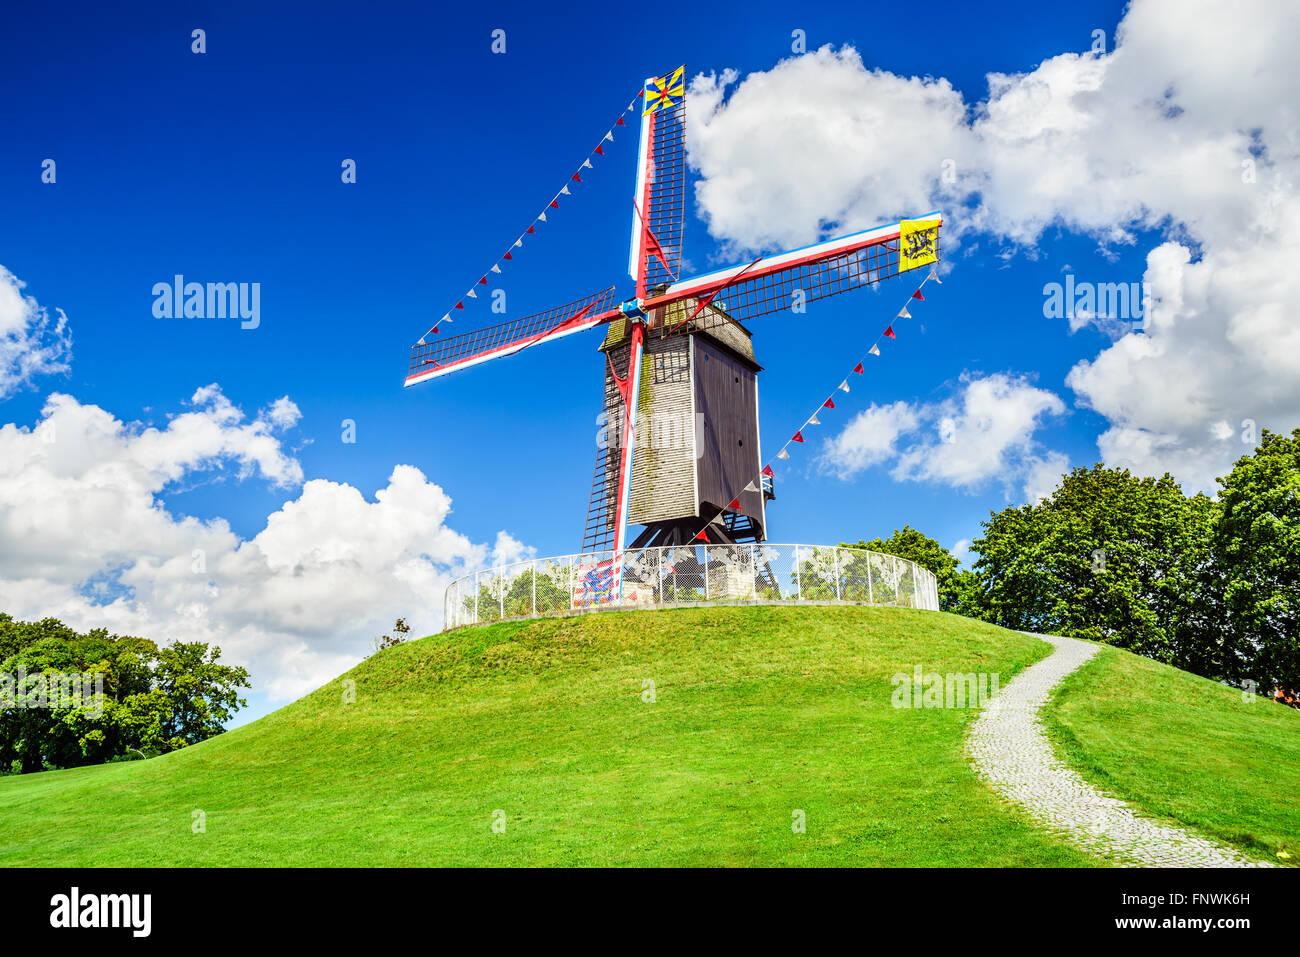 Bruges, Belgium. Sint Janshuismolen wind mill dating from 1770, still in its original spot, West Flanders Stock Photo